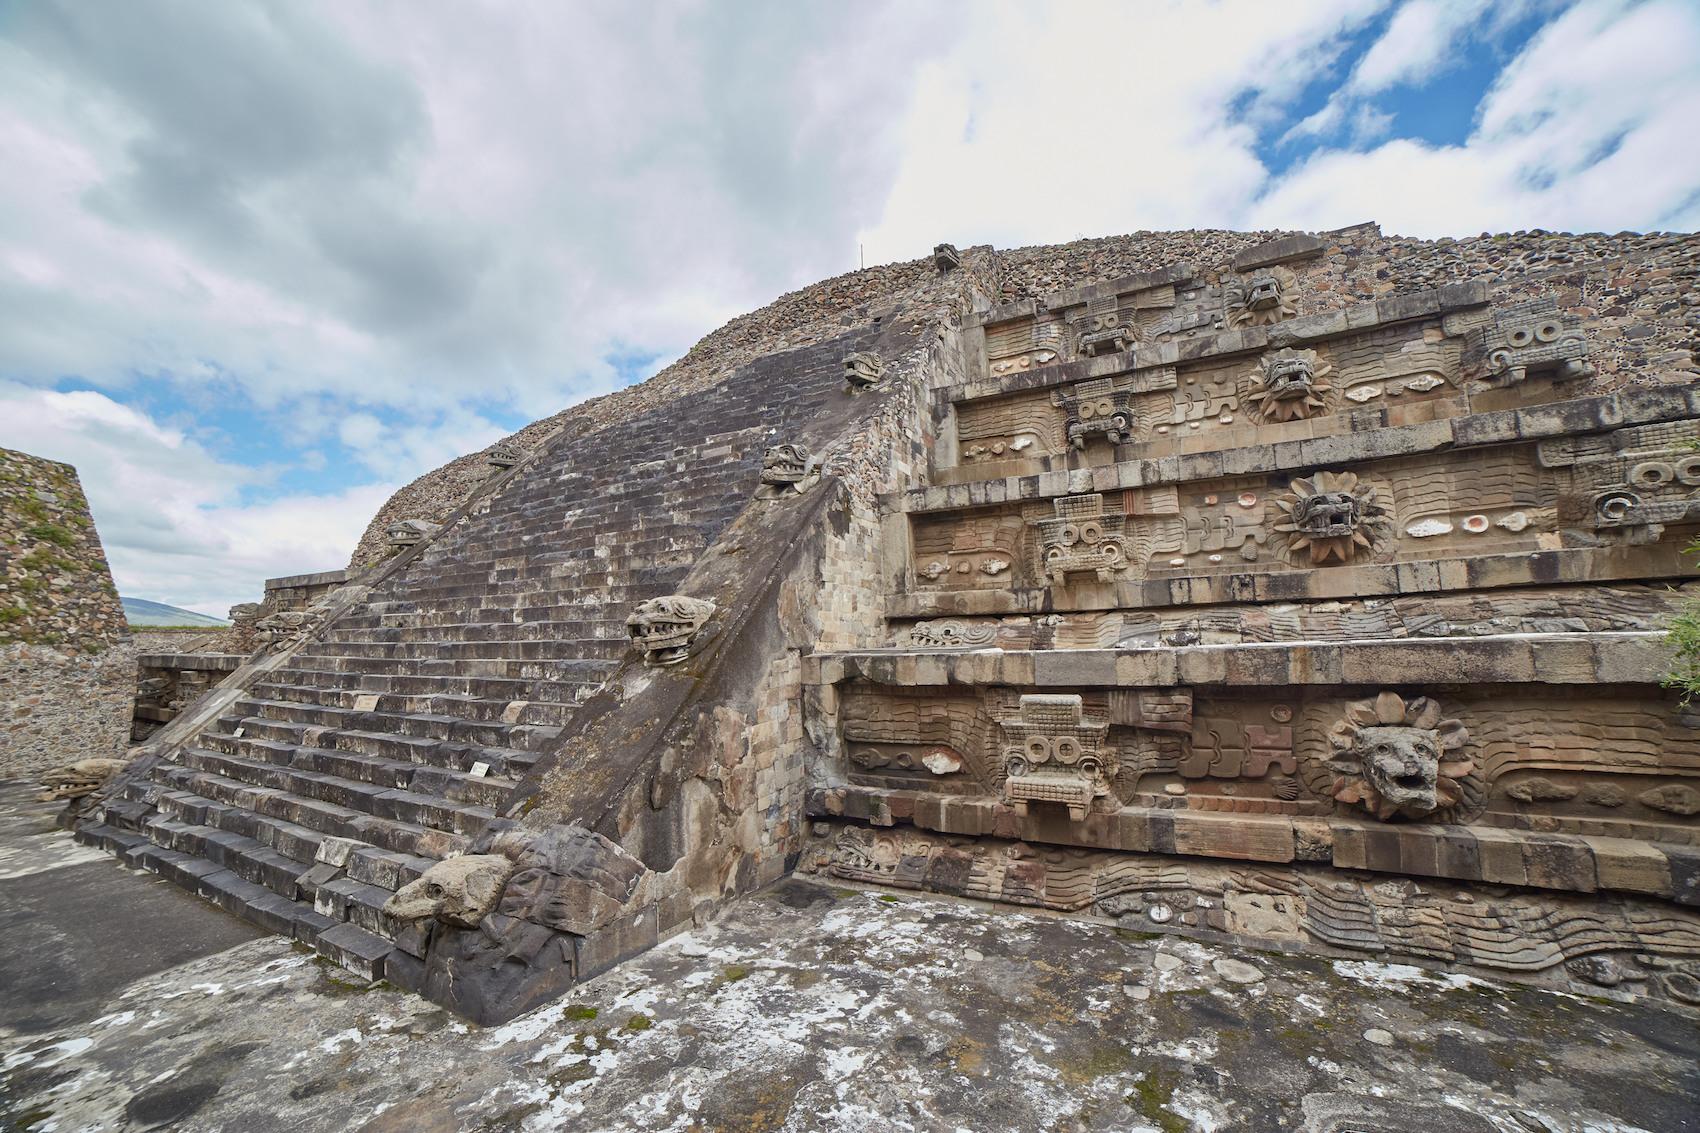 Quetzalcoatl Pyramid Teotihuacan